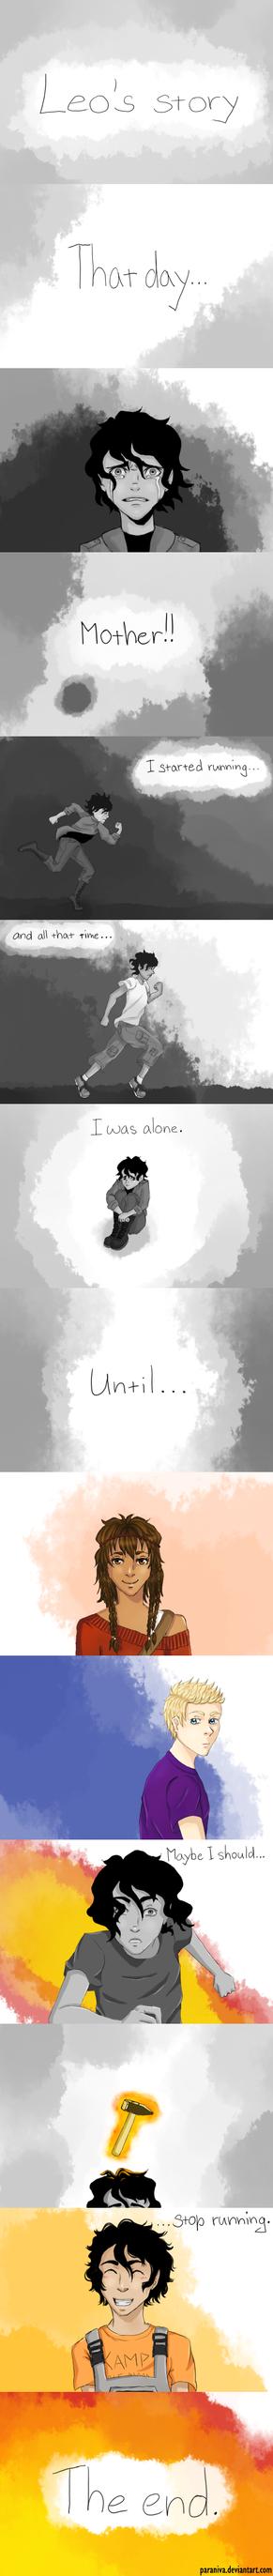 Leo's story by paraniva